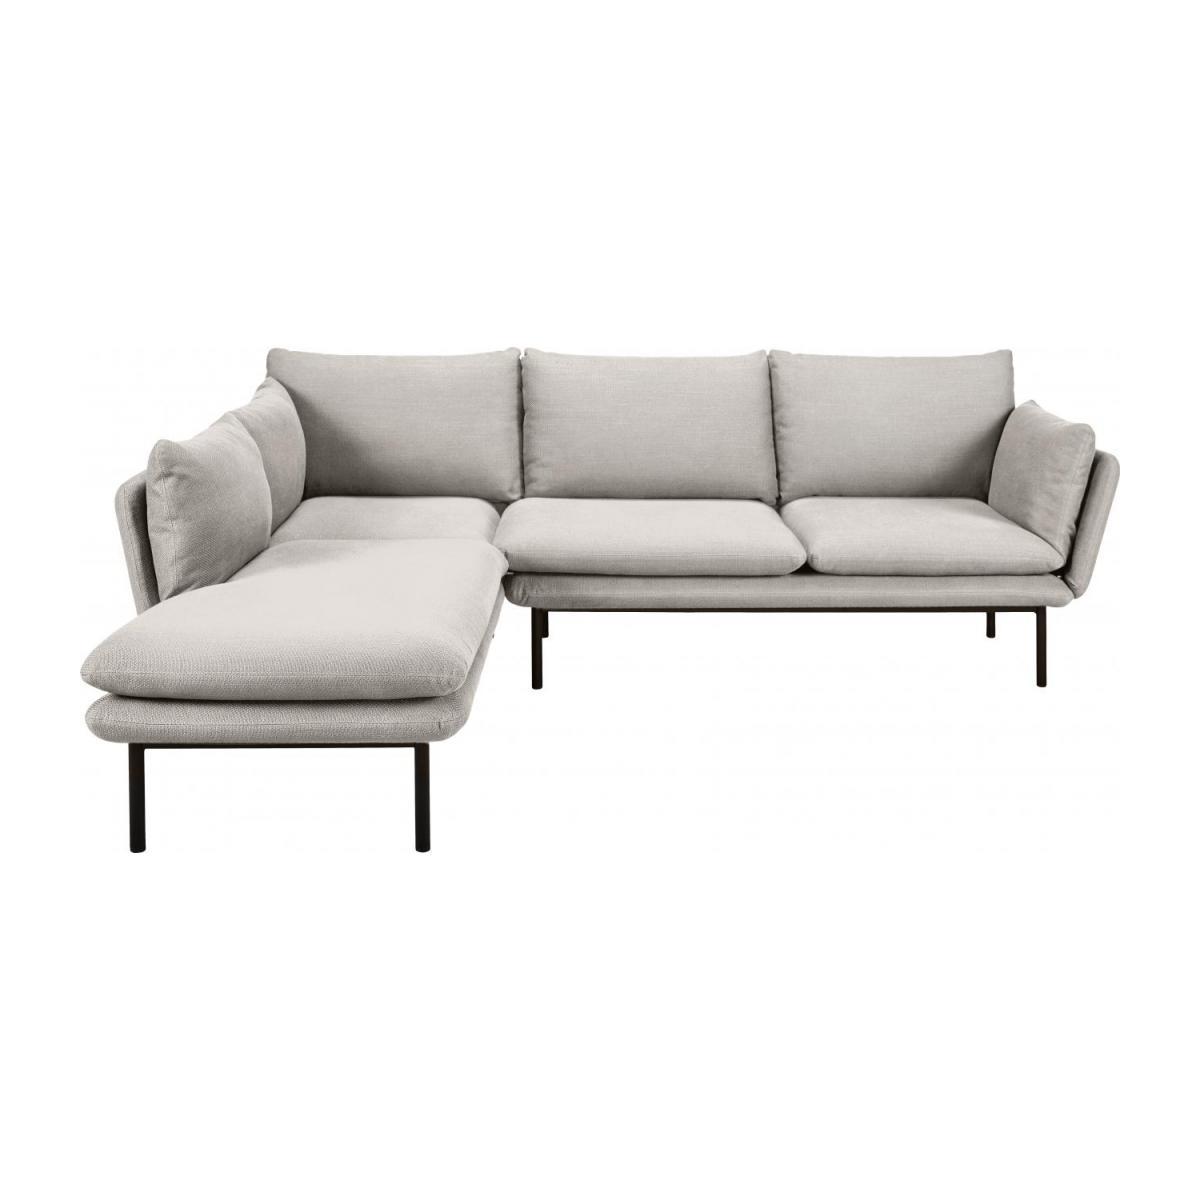 Full Size of Sofa Grau Stoff Ikea Sofas 3er Reinigen Graues Schlaffunktion Big Grauer Couch Grober Kaufen Chesterfield Riva 2 Sitzer Aus Mit Chaiselongue Links Habitat Sofa Sofa Stoff Grau